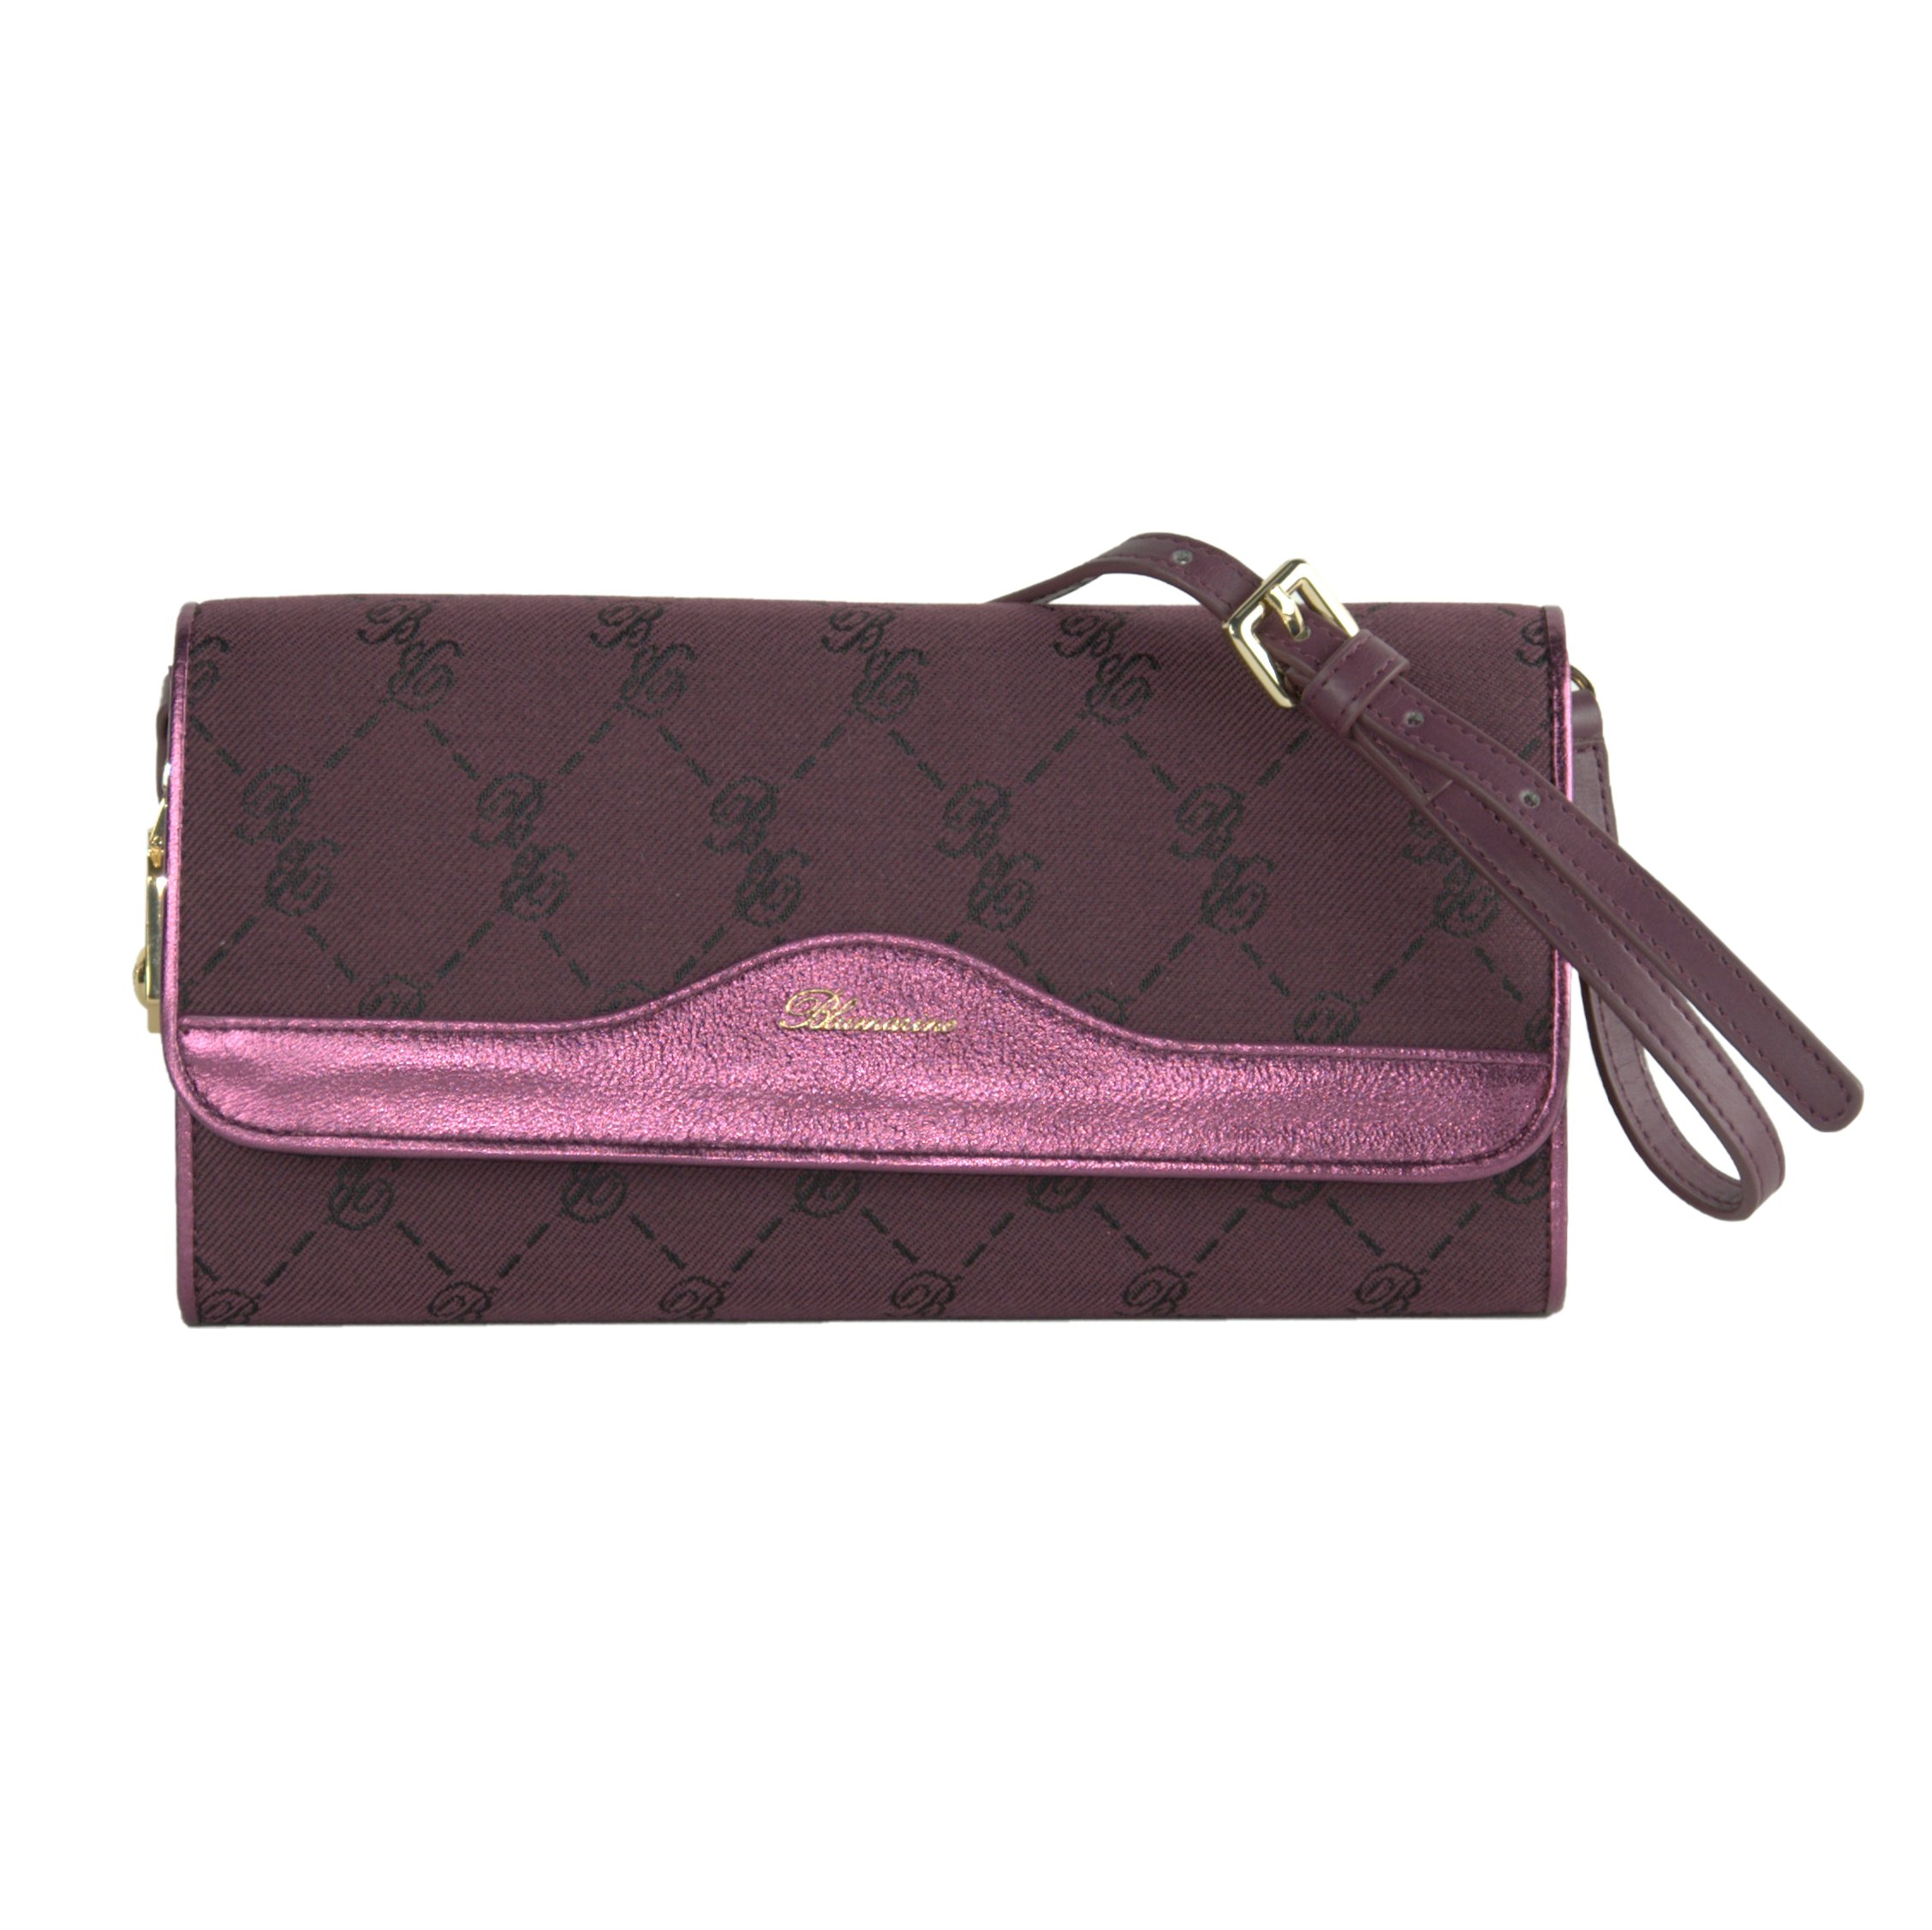 Blumarine Women's Clutch Bag Purple BL1421372